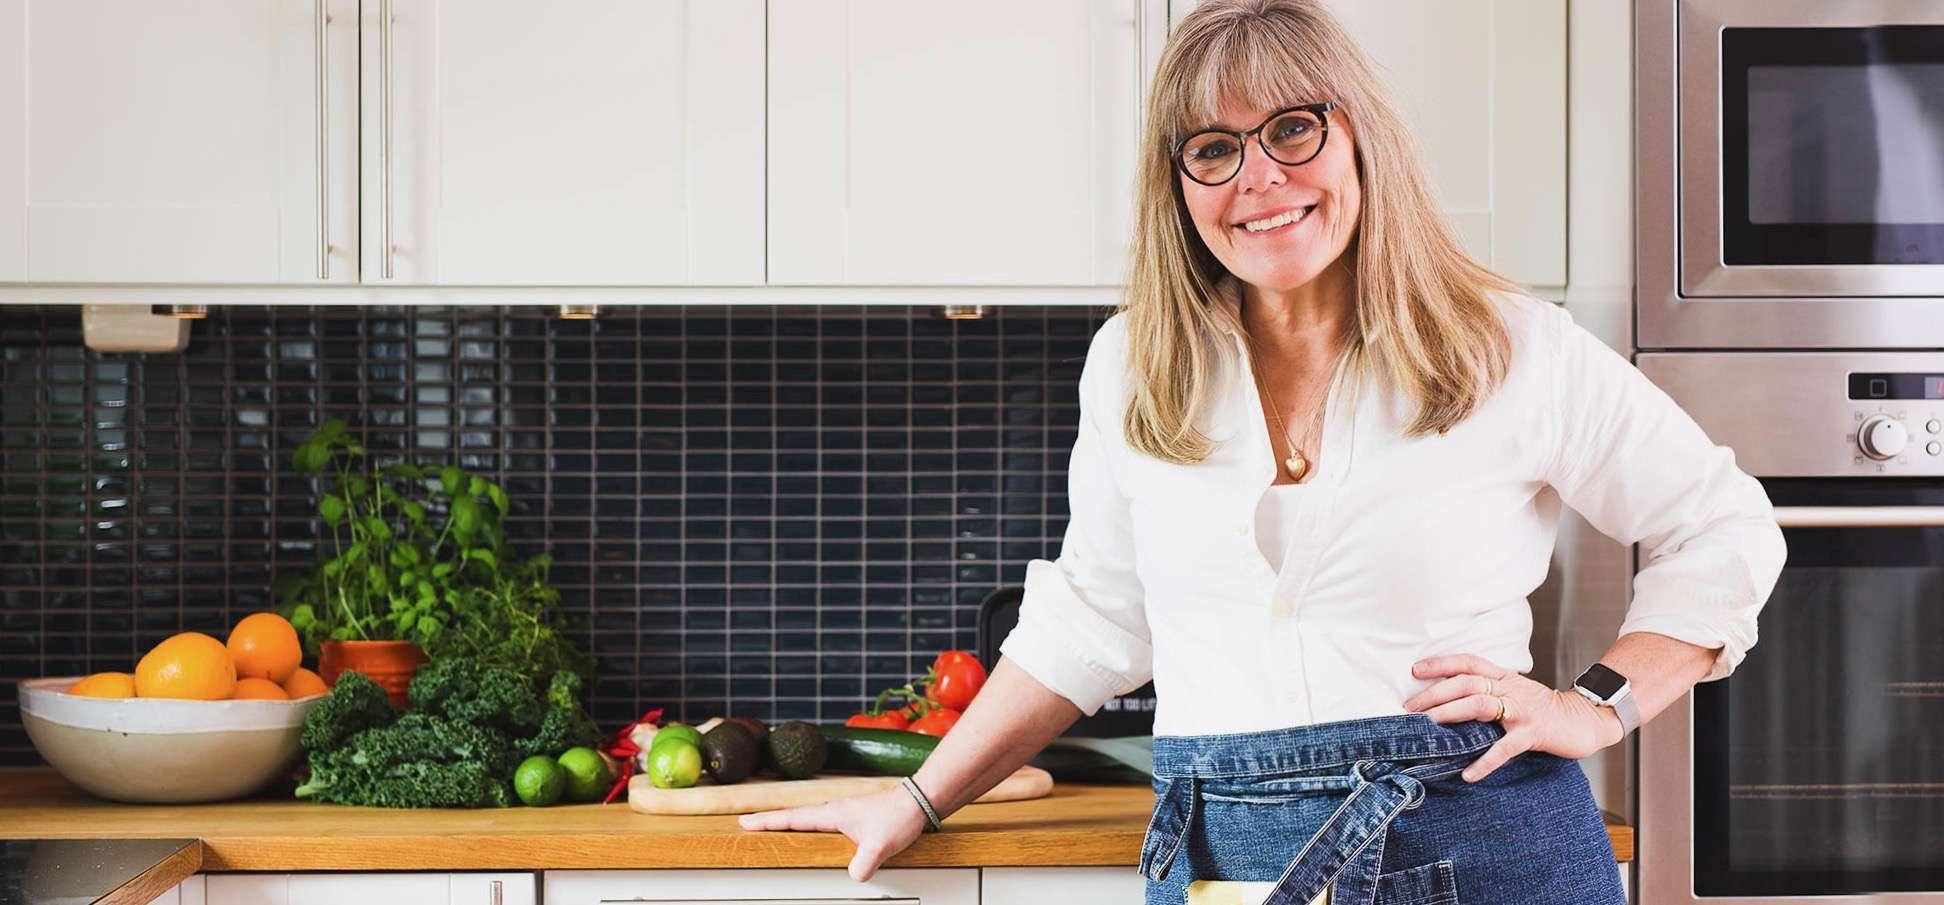 Gisela i sitt kök